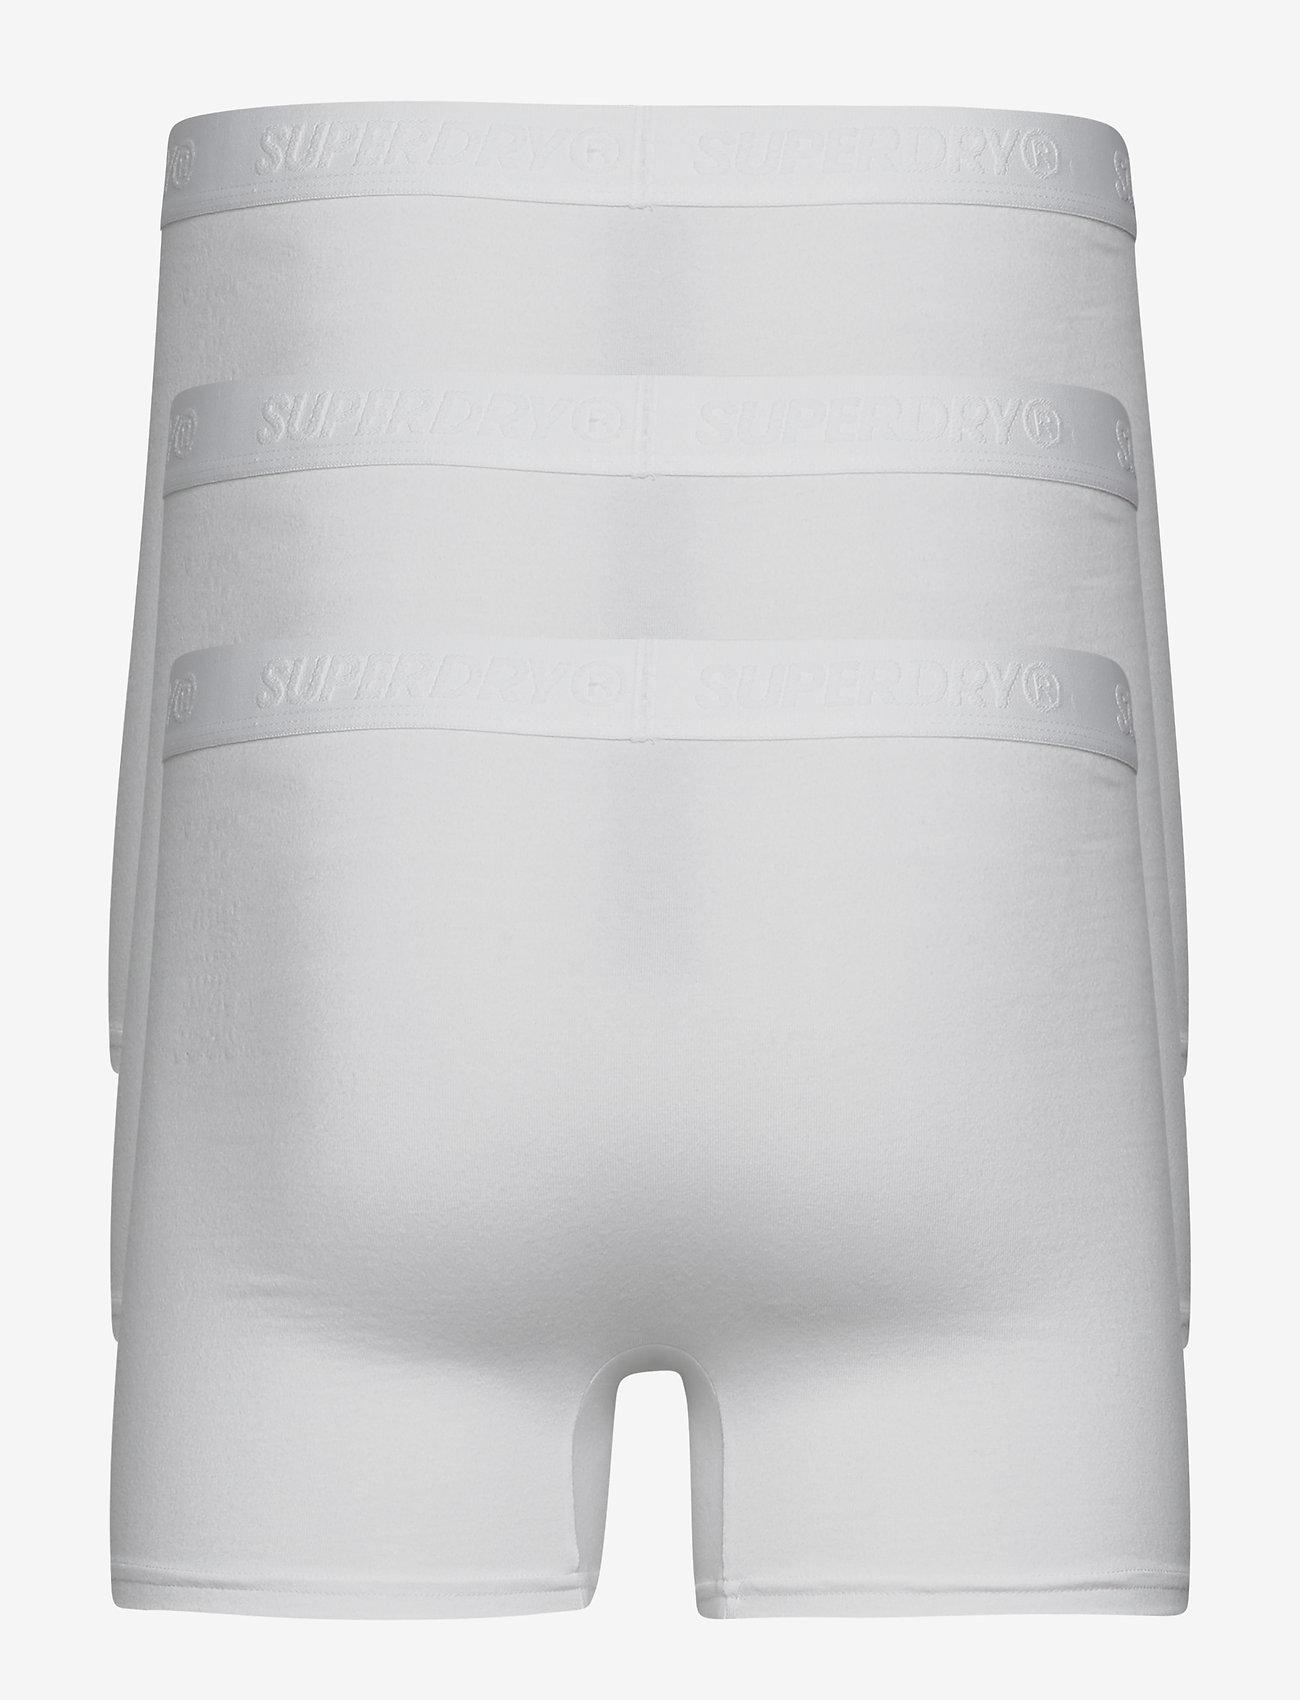 Superdry - CLASSIC BOXER TRIPLE PACK - undertøy - white multipack